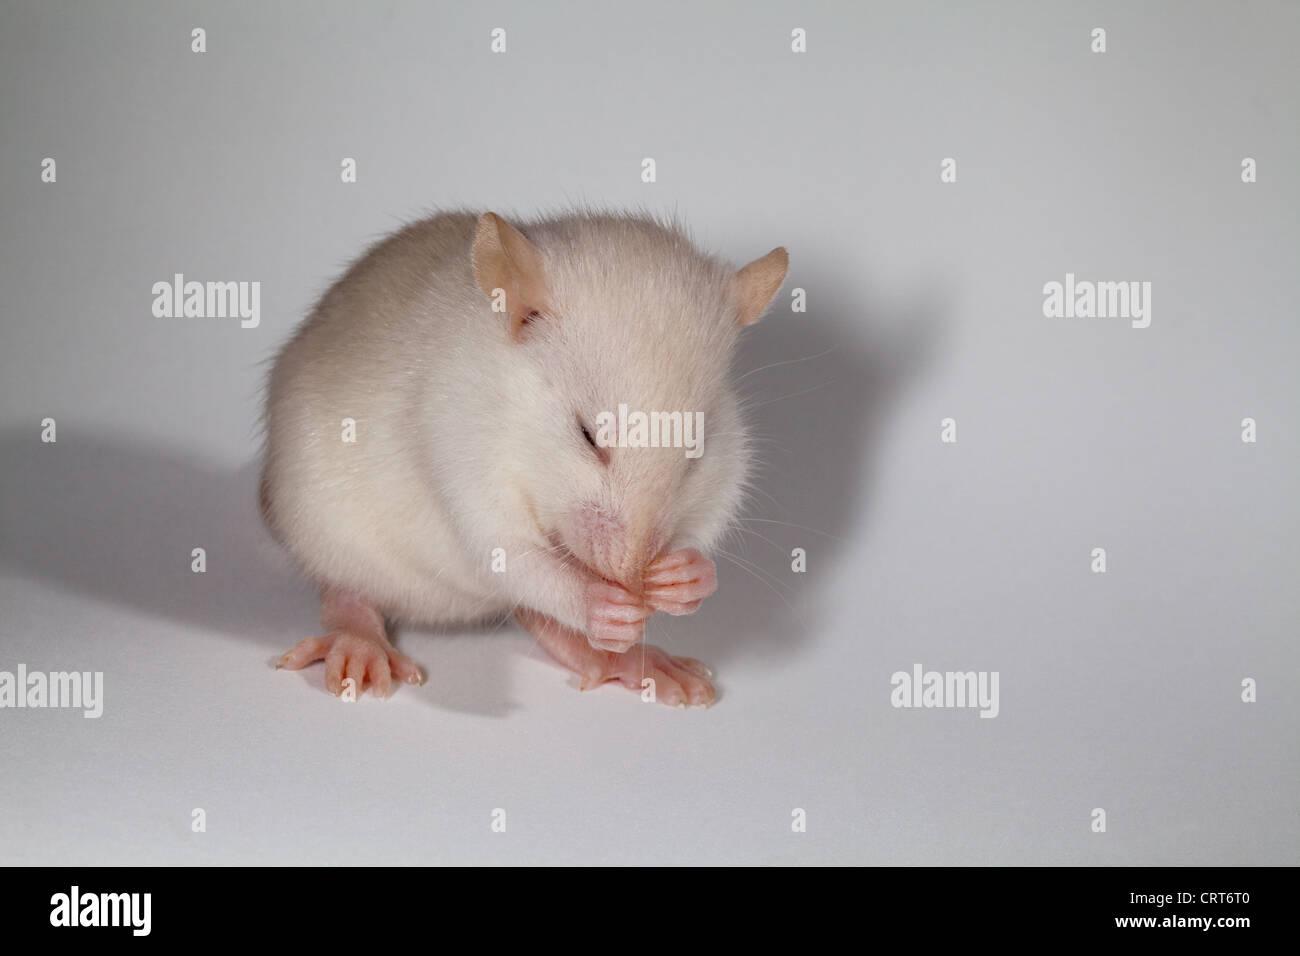 Young White Rat (Rattus norvegicus). Albino. Lacking pigmentation in skin, fur and eyes. Washing. Grooming. - Stock Image